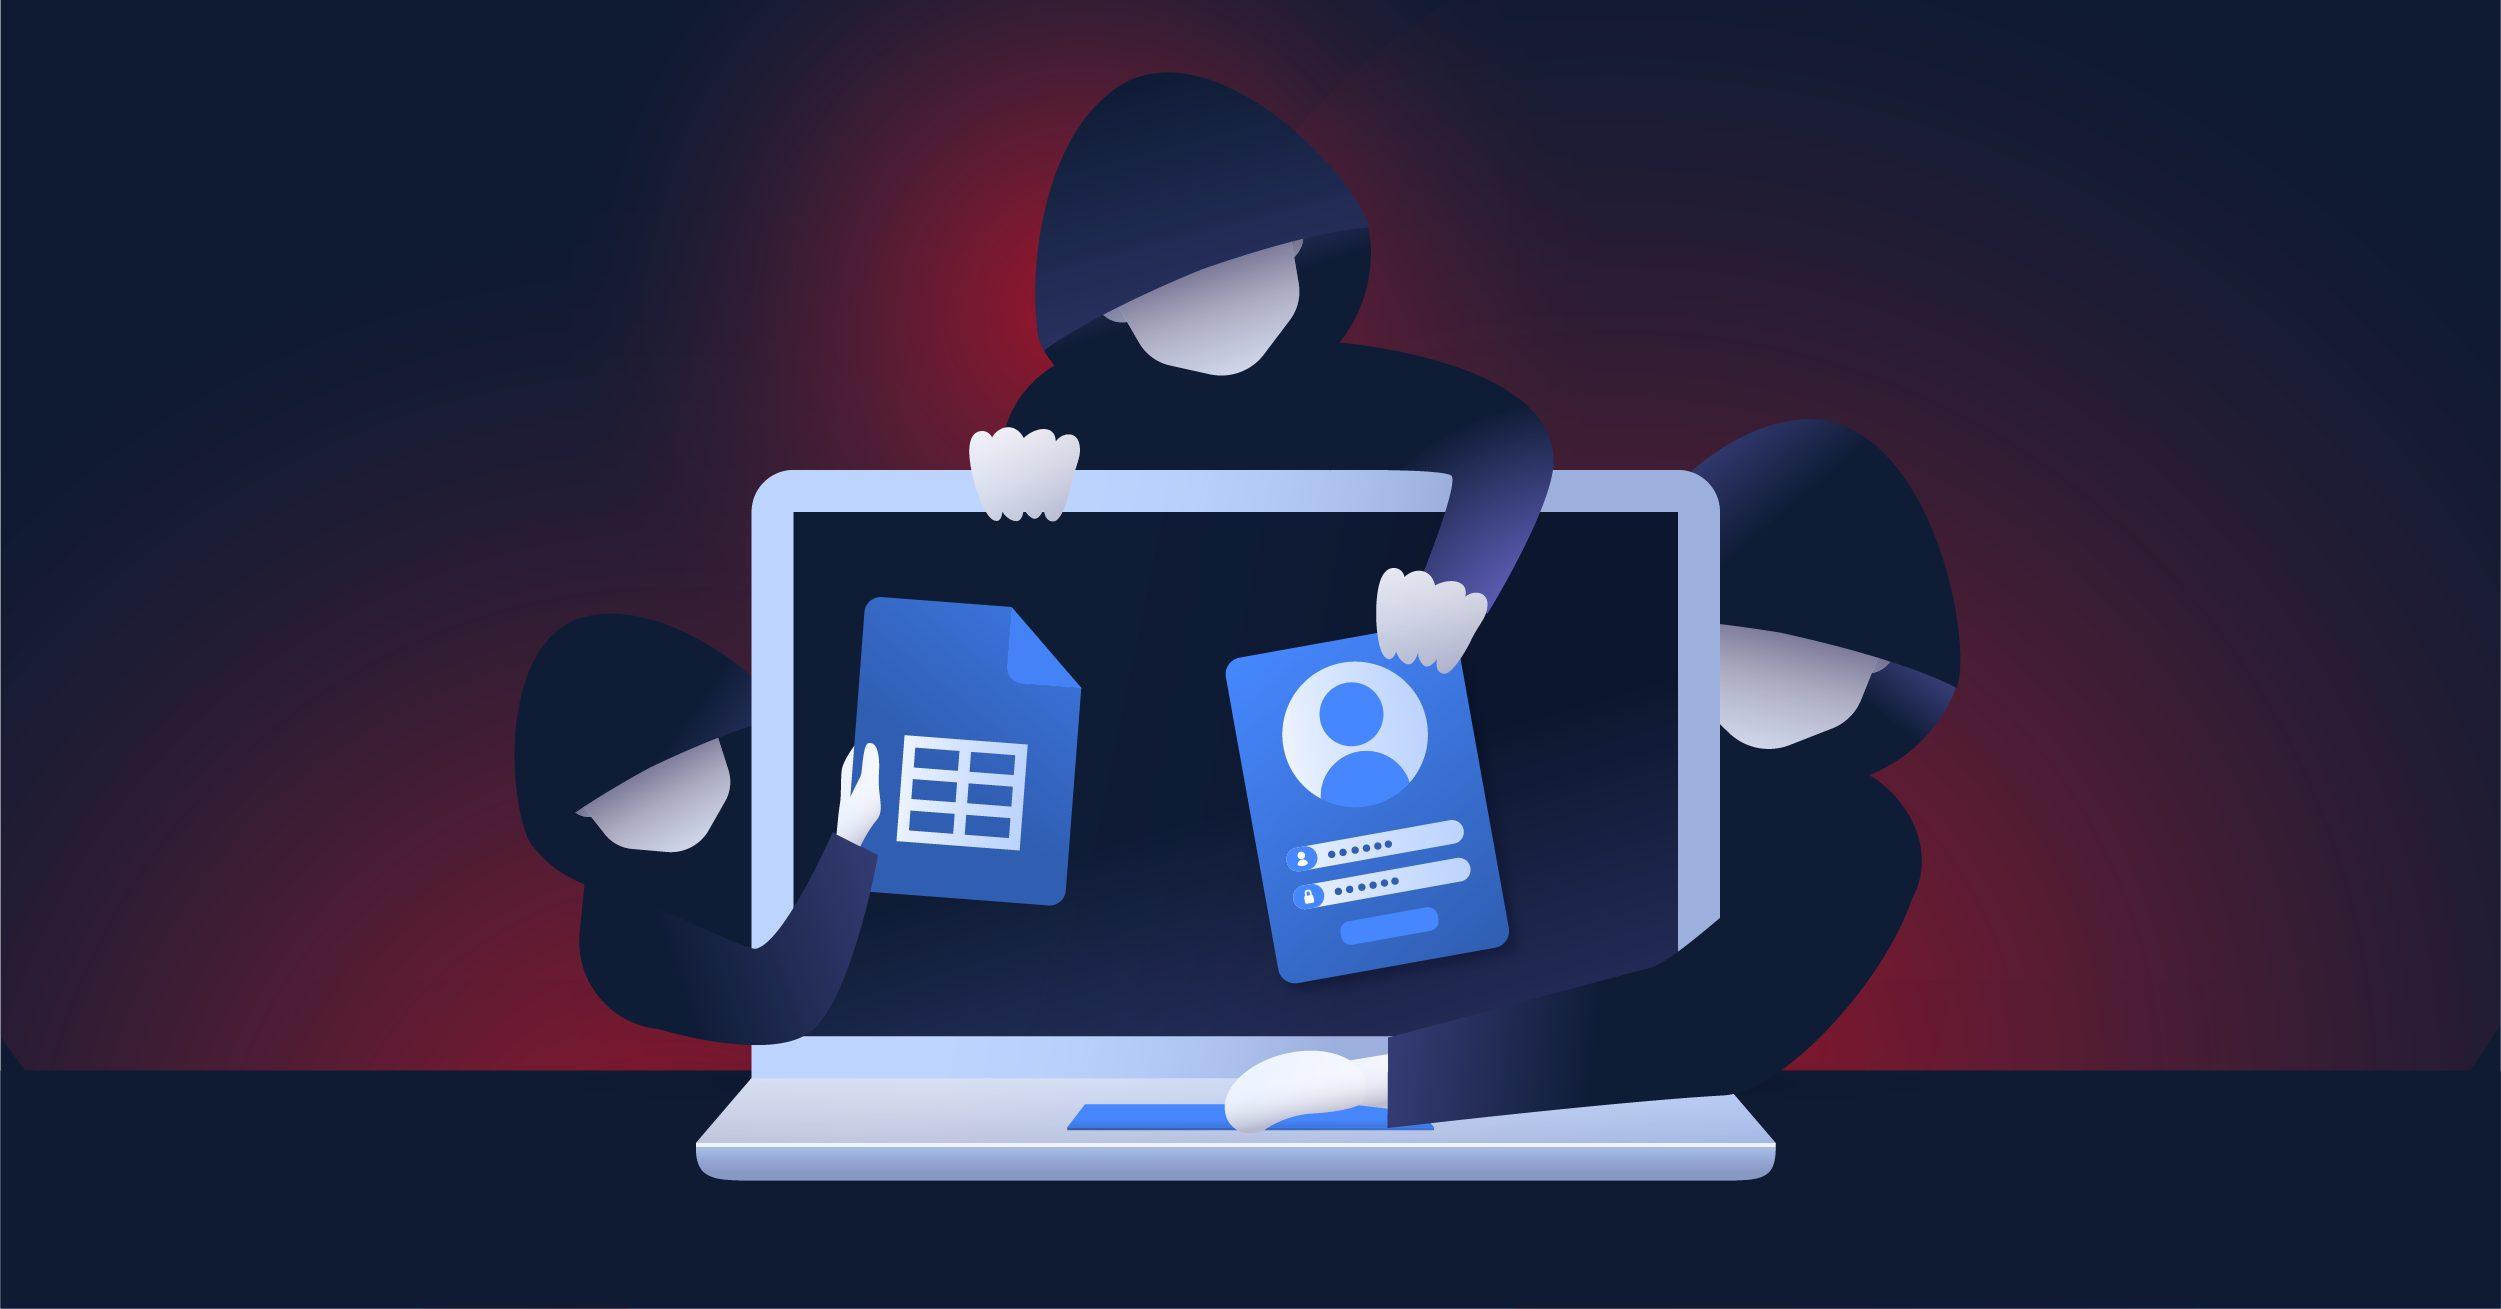 Microsoft Exchange leaves doors open to hackers